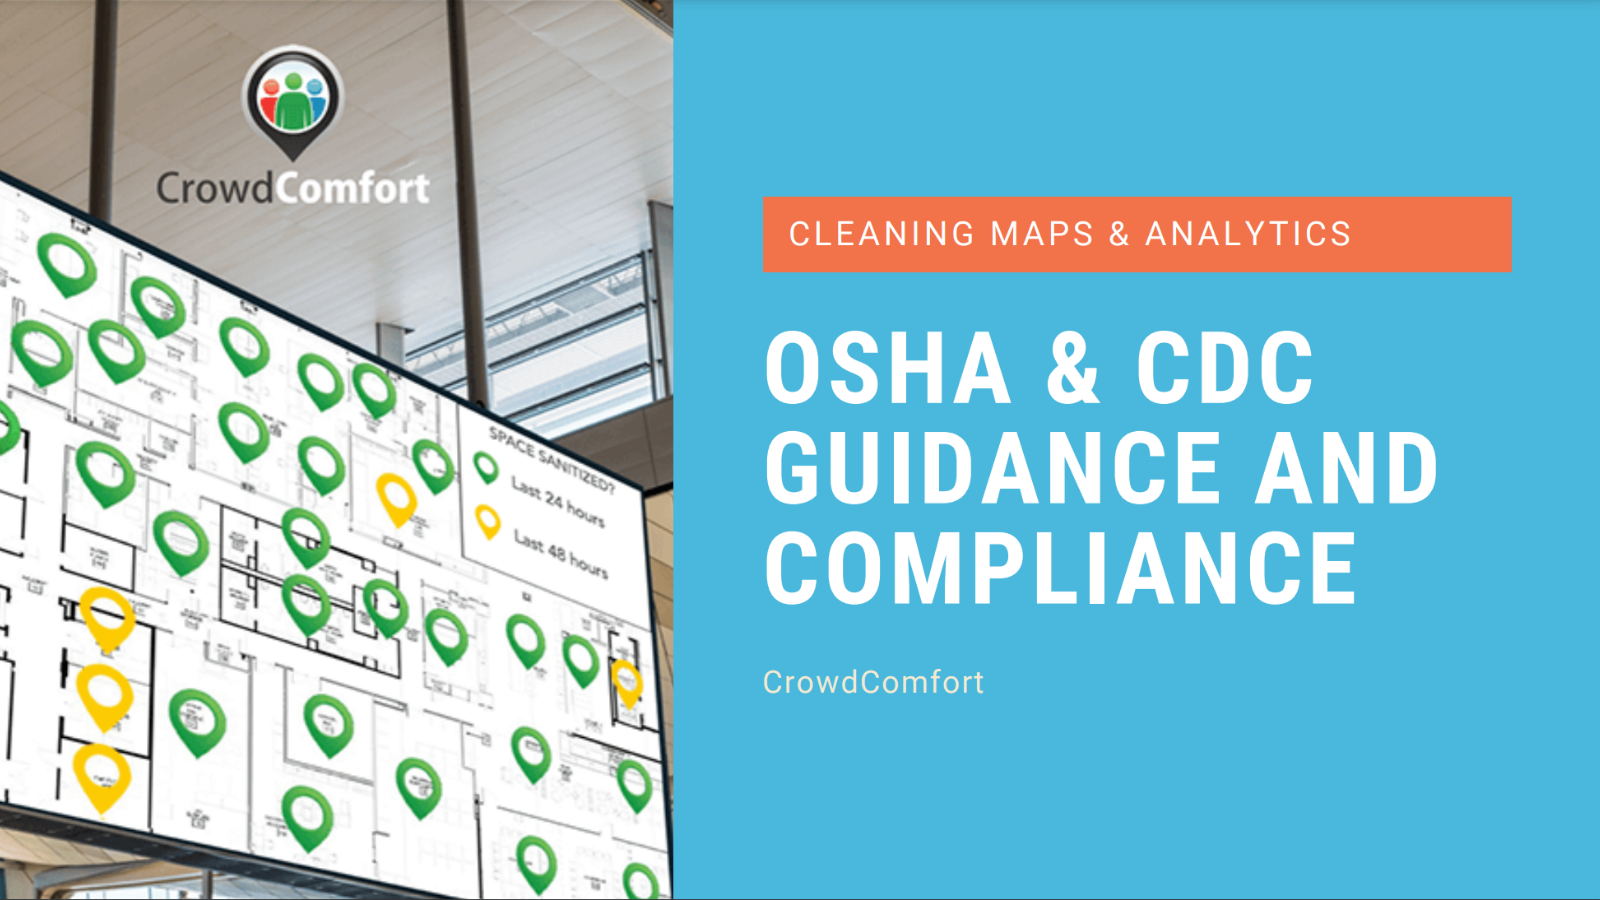 OSHA & CDC Guidance & Compliance Overview